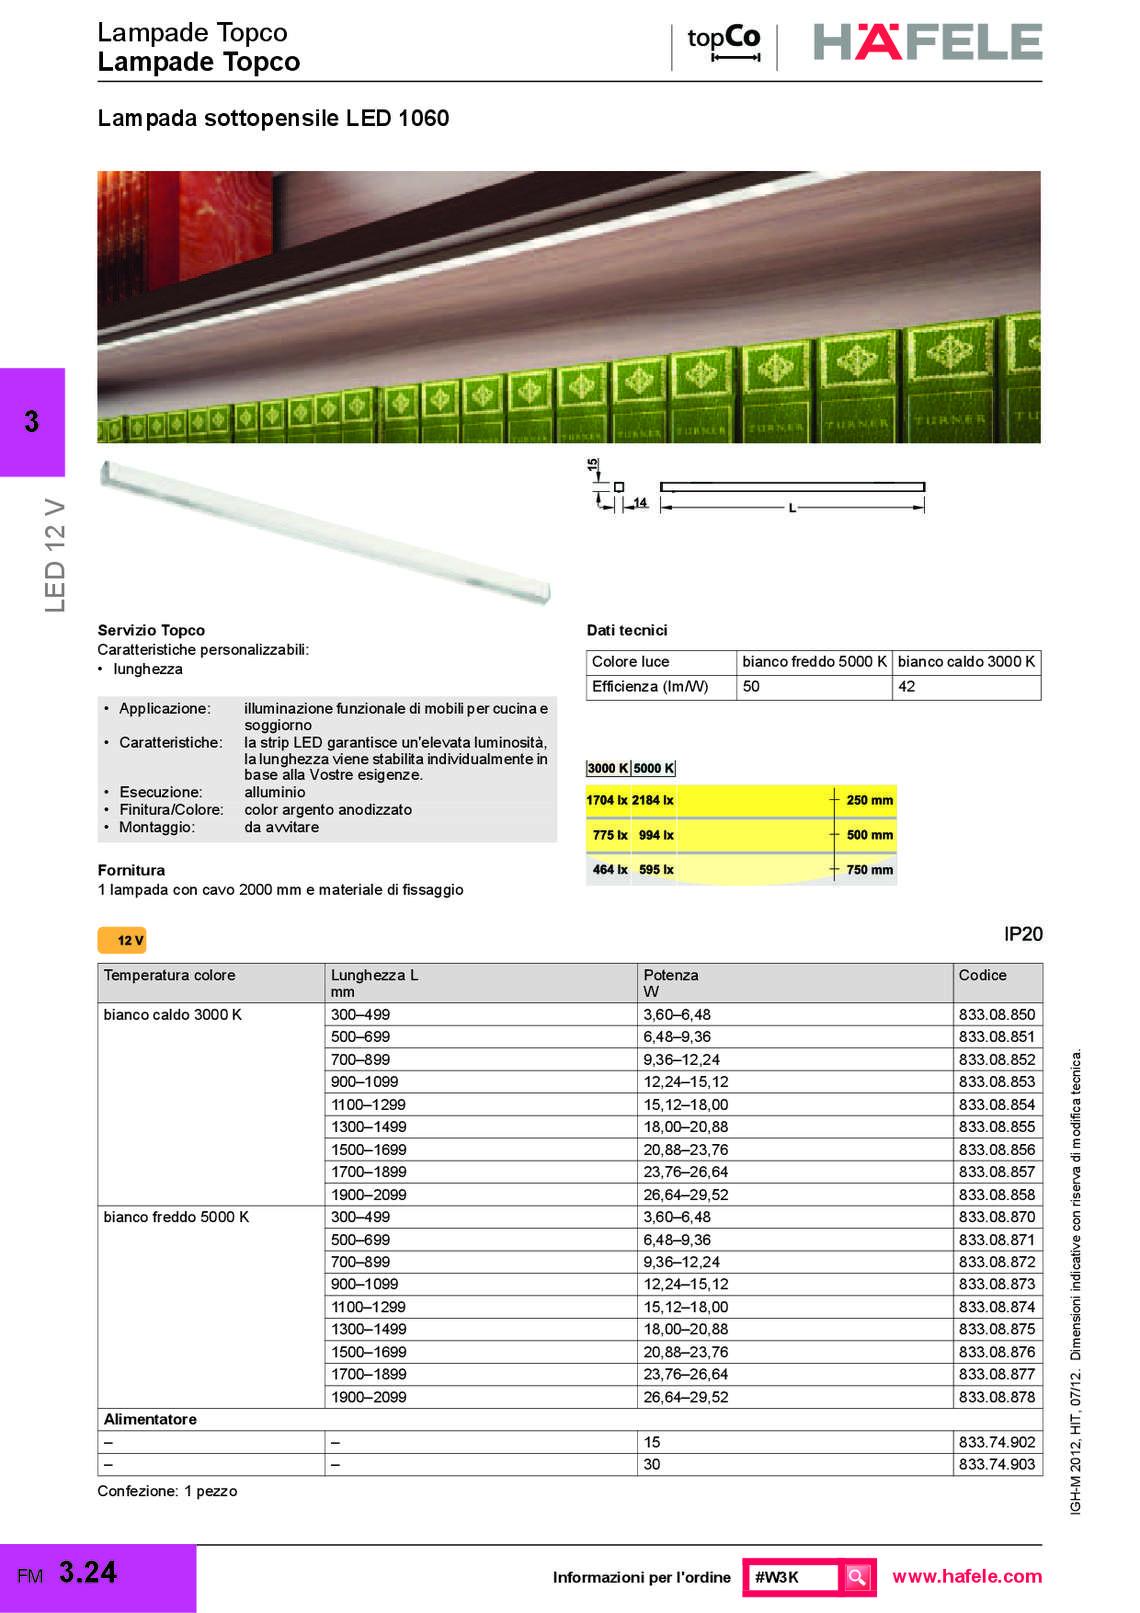 hafele-prodotti-su-misura_81_037.jpg